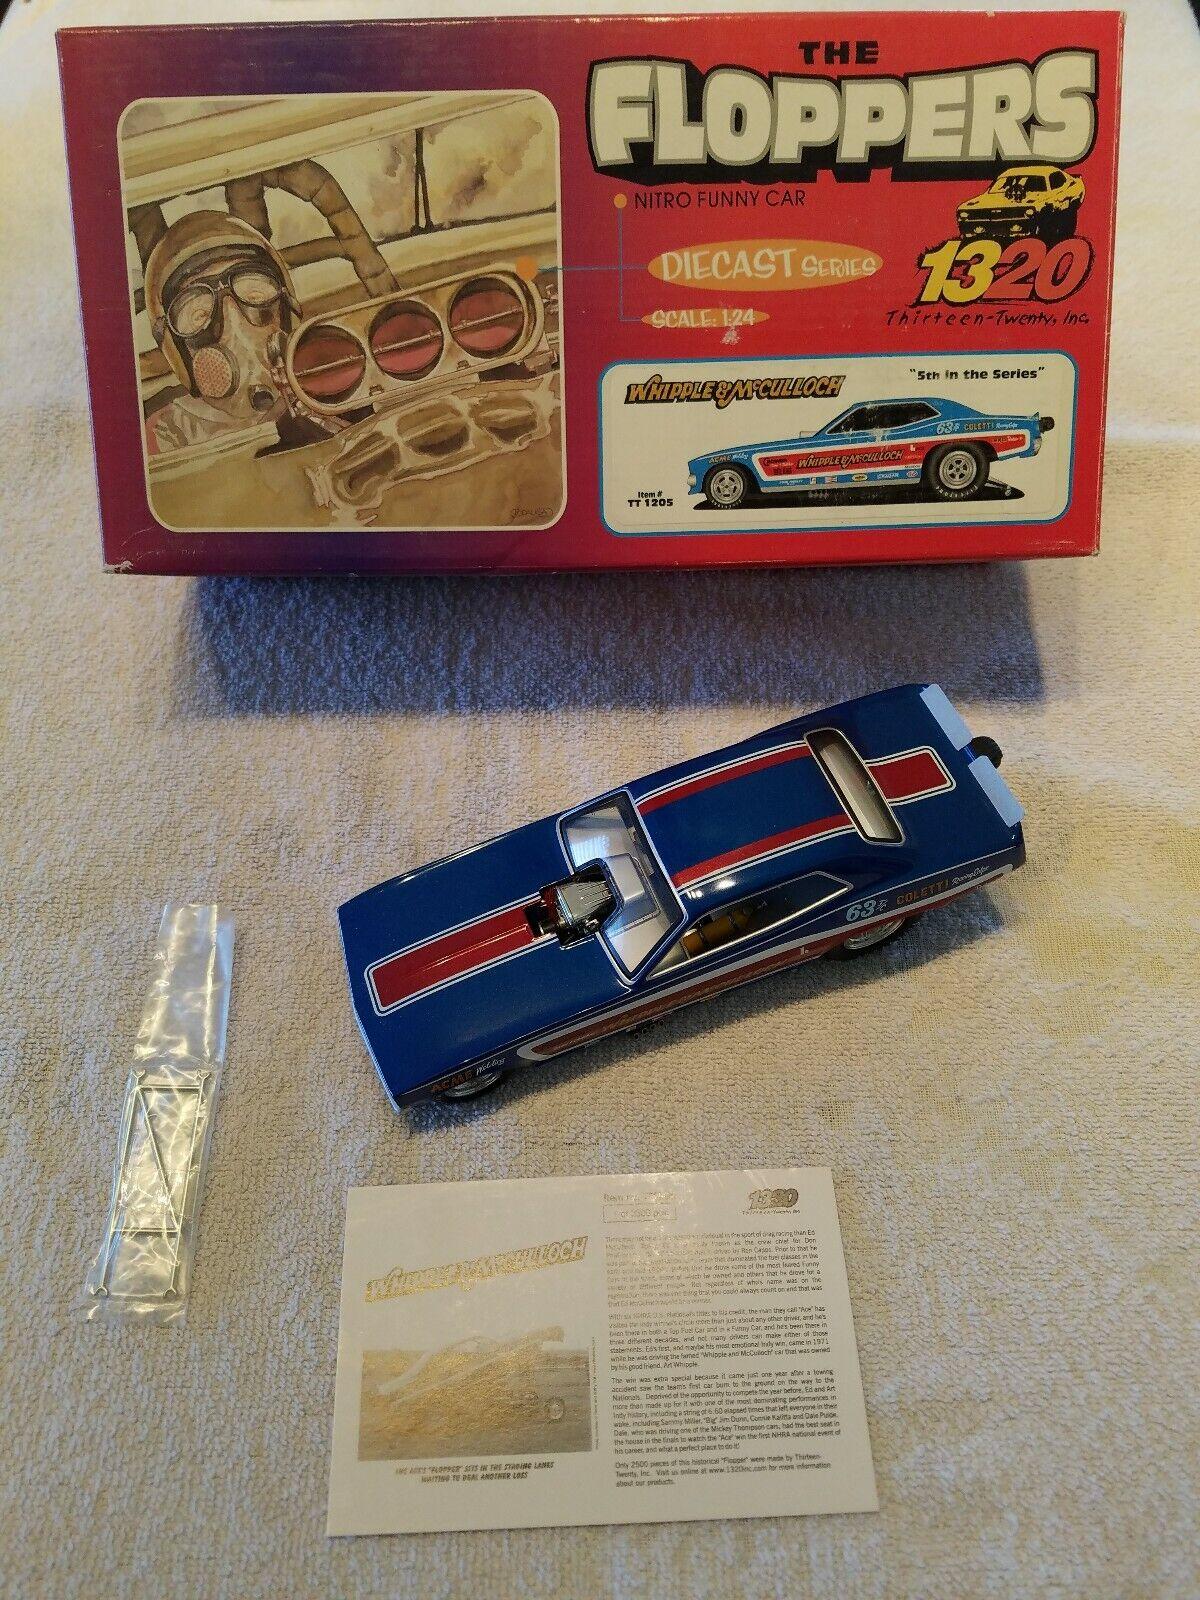 Whipple & McCullough 1971 Plymouth Cuda 1 24 Funny Car (Ed McCullough) Limited